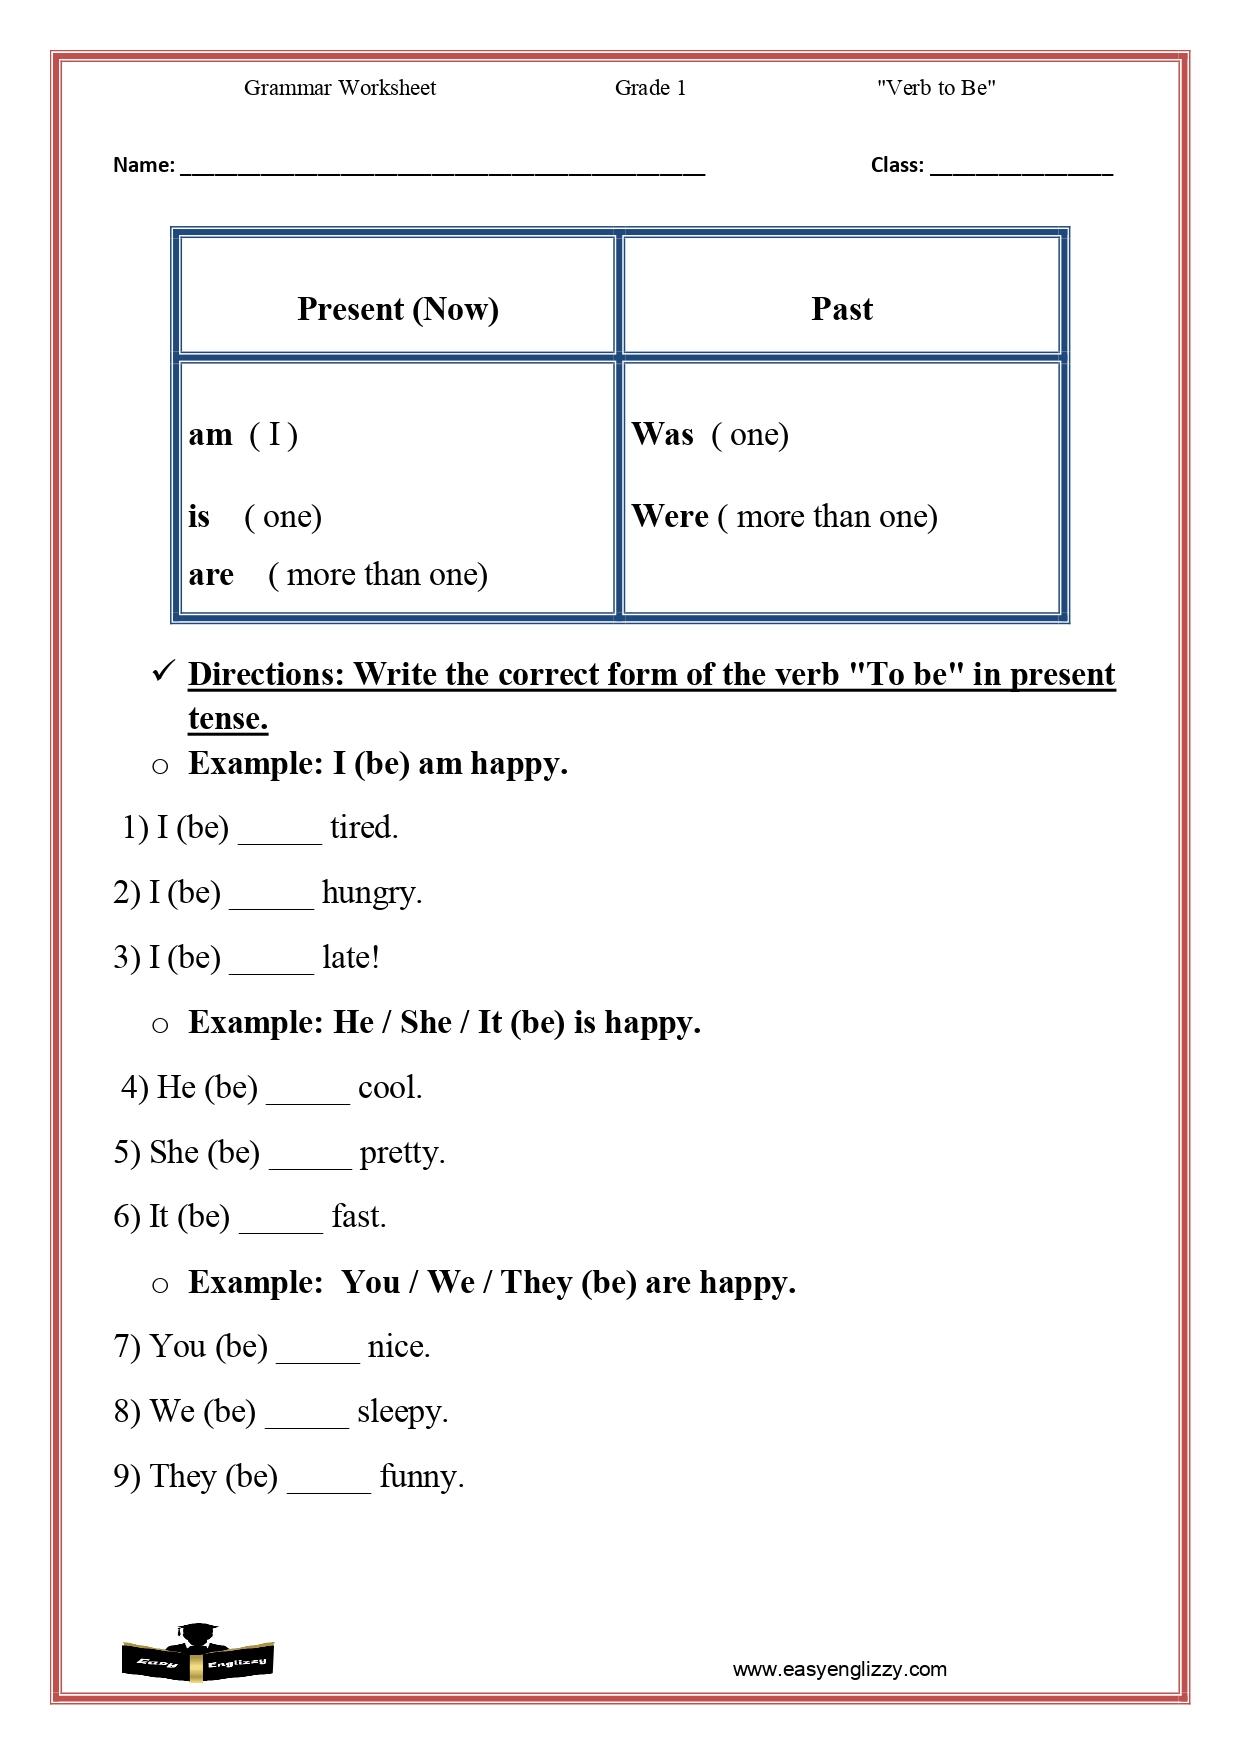 hight resolution of Verb Worksheet For Class 1   www.robertdee.org